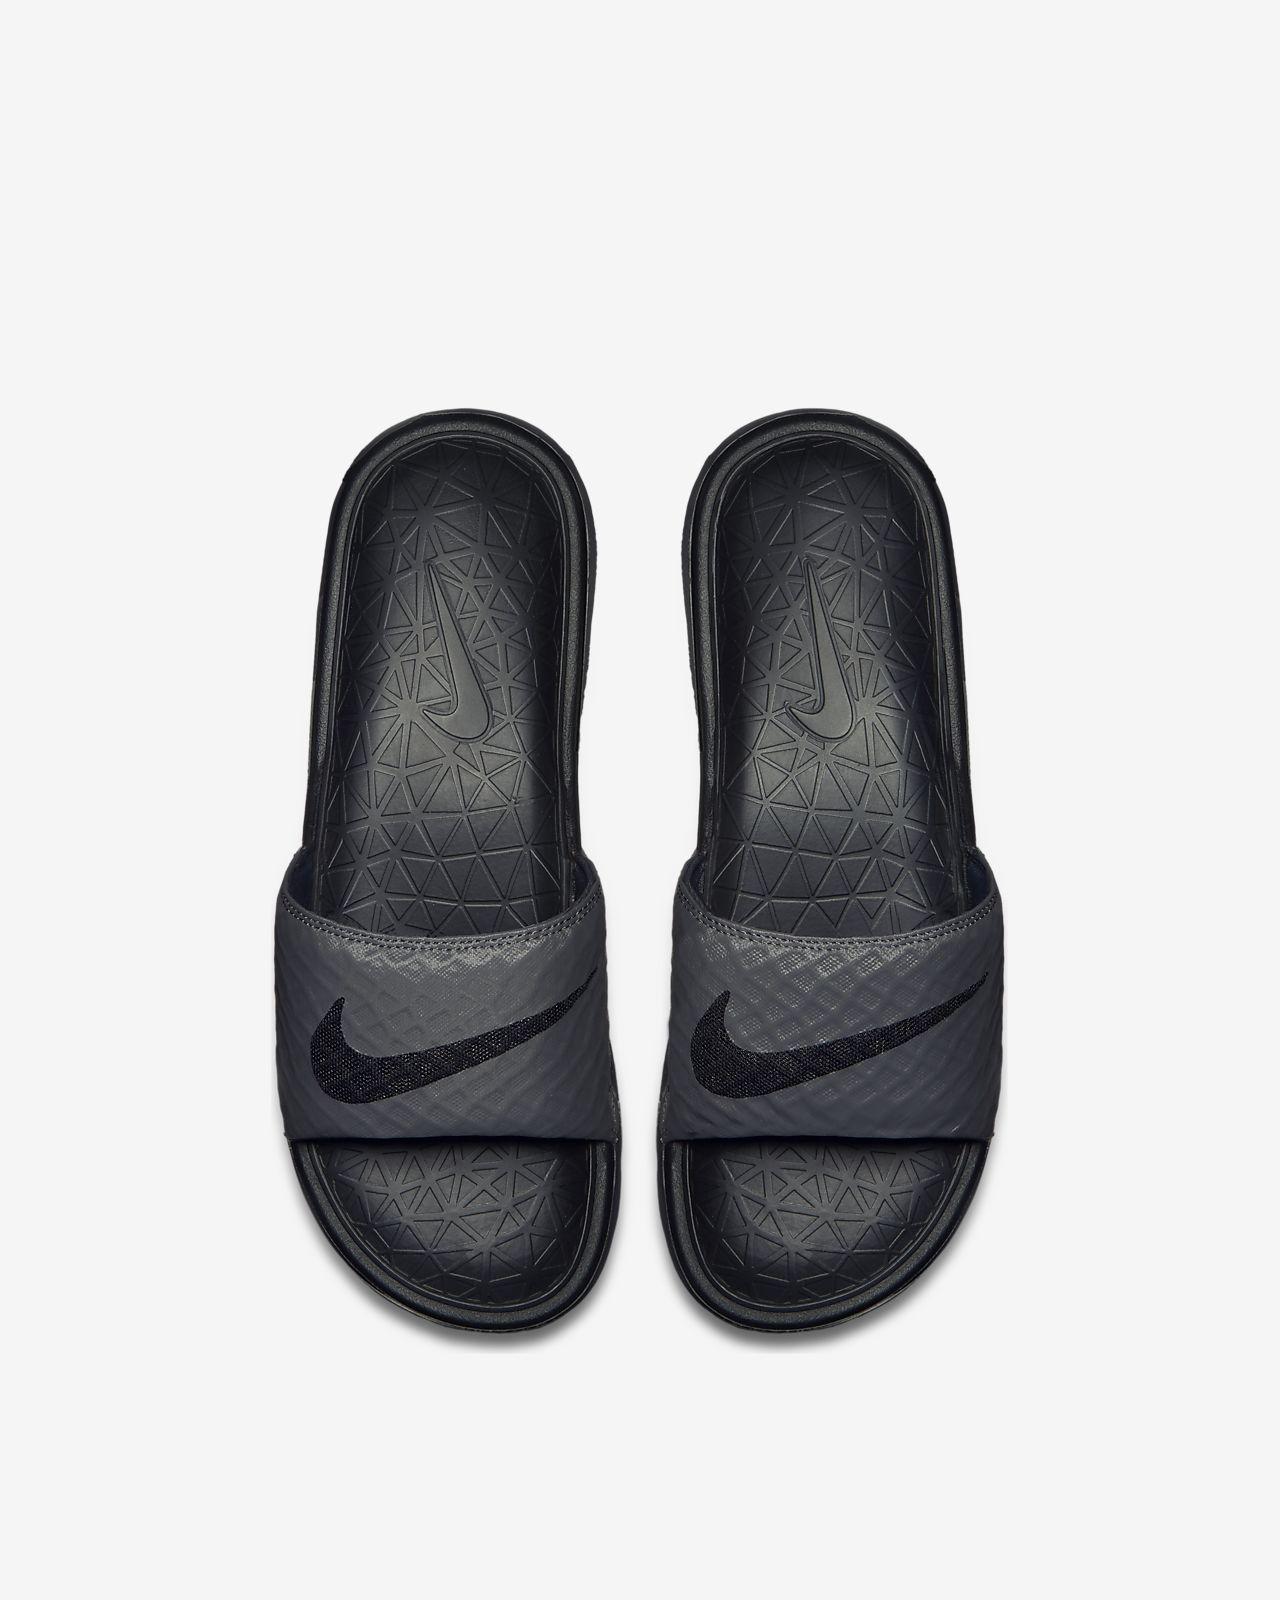 4042214eef Claquette Nike Benassi Solarsoft 2 pour Homme. Nike.com FR